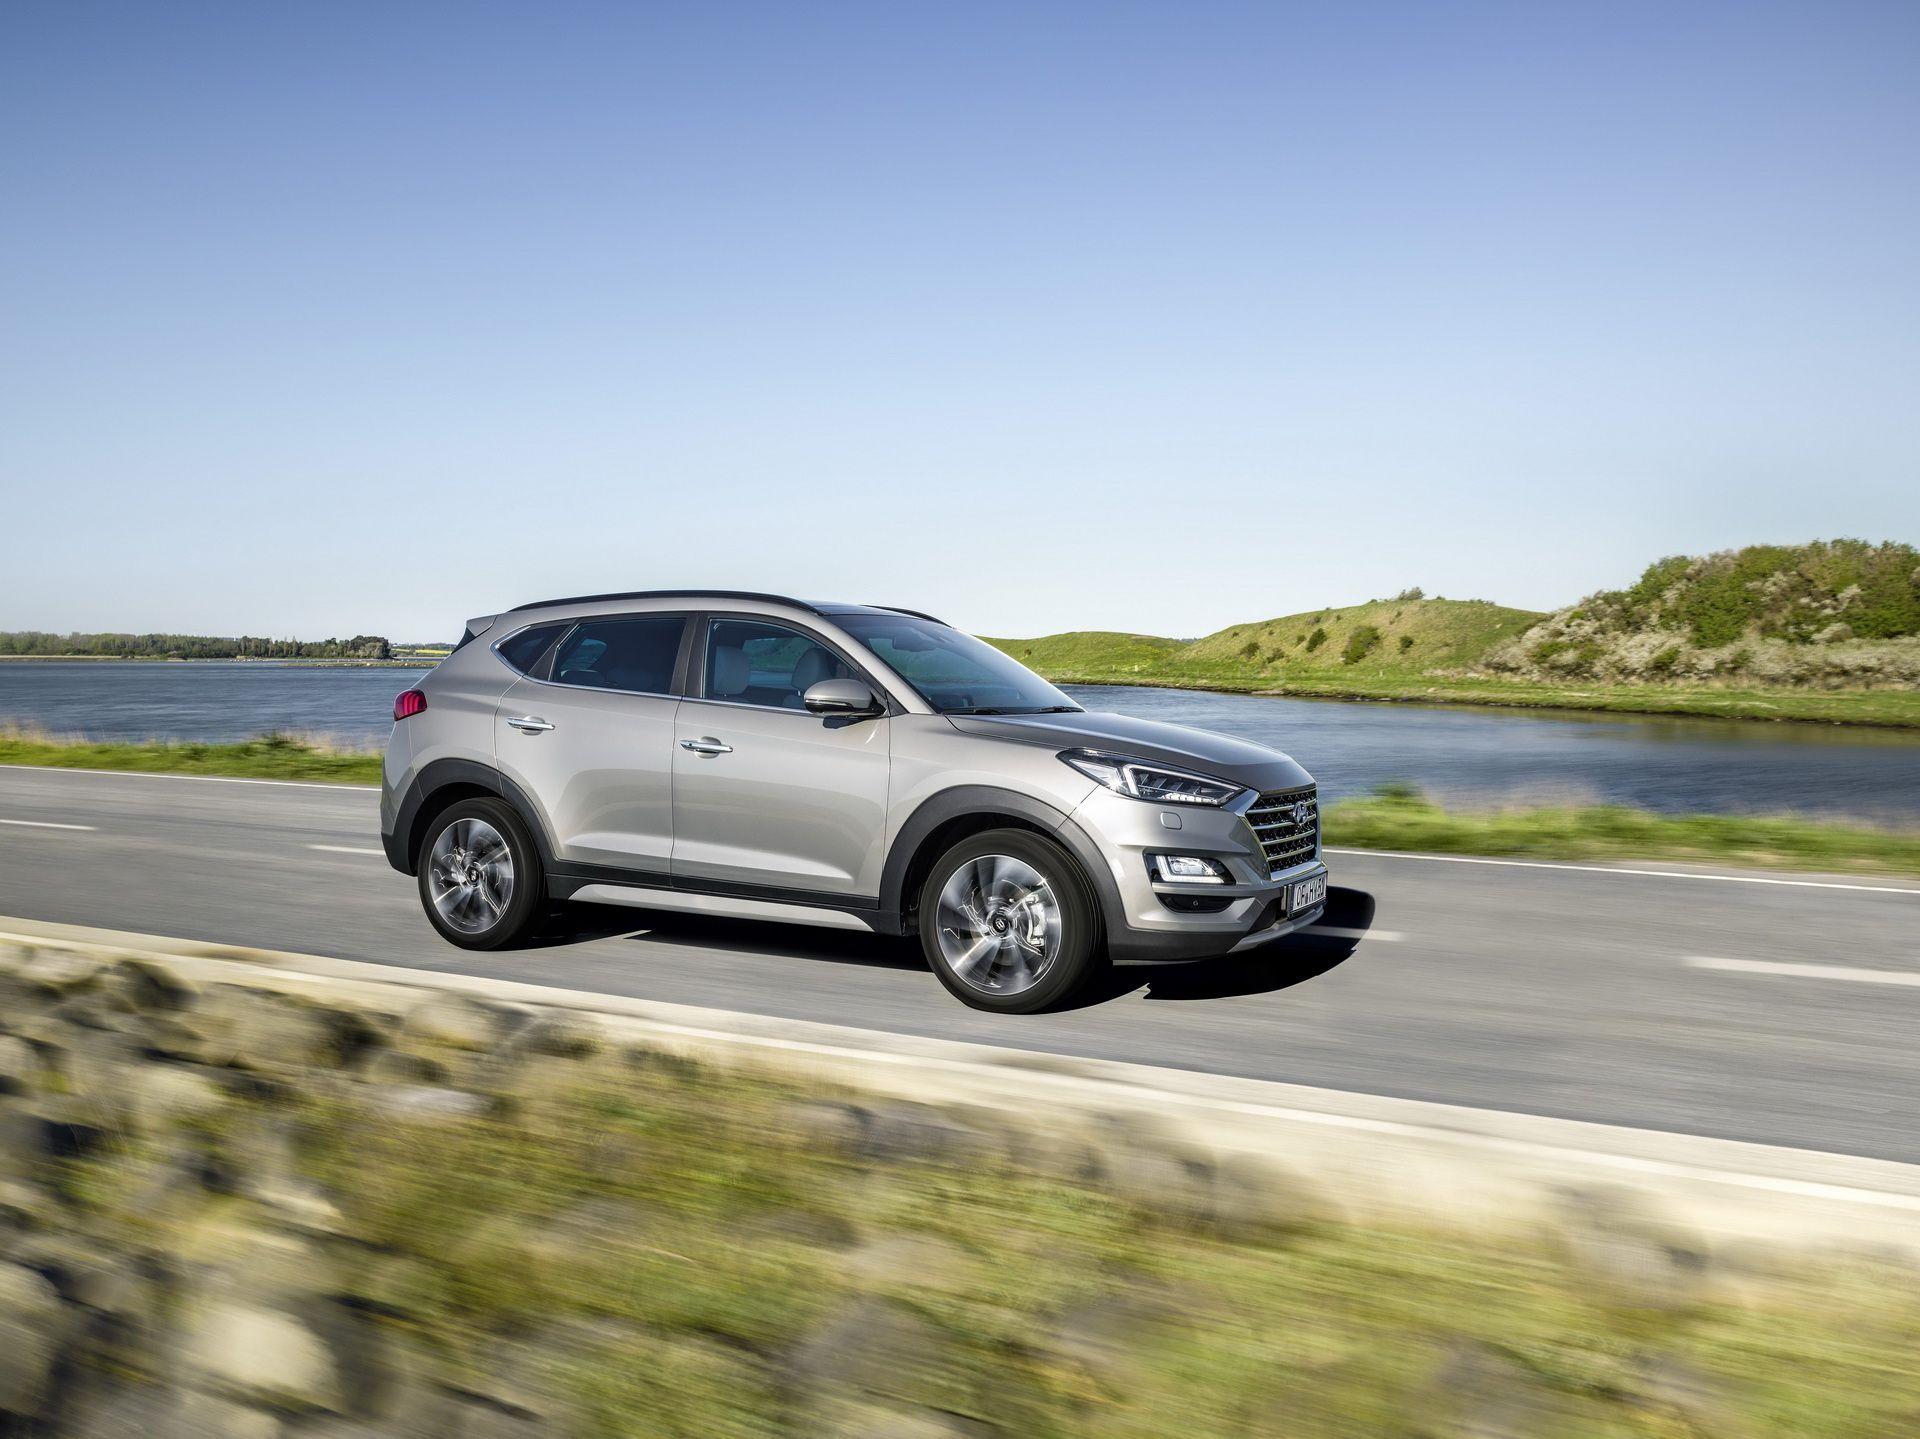 Hyundai Tucson facelift 2019 (9)